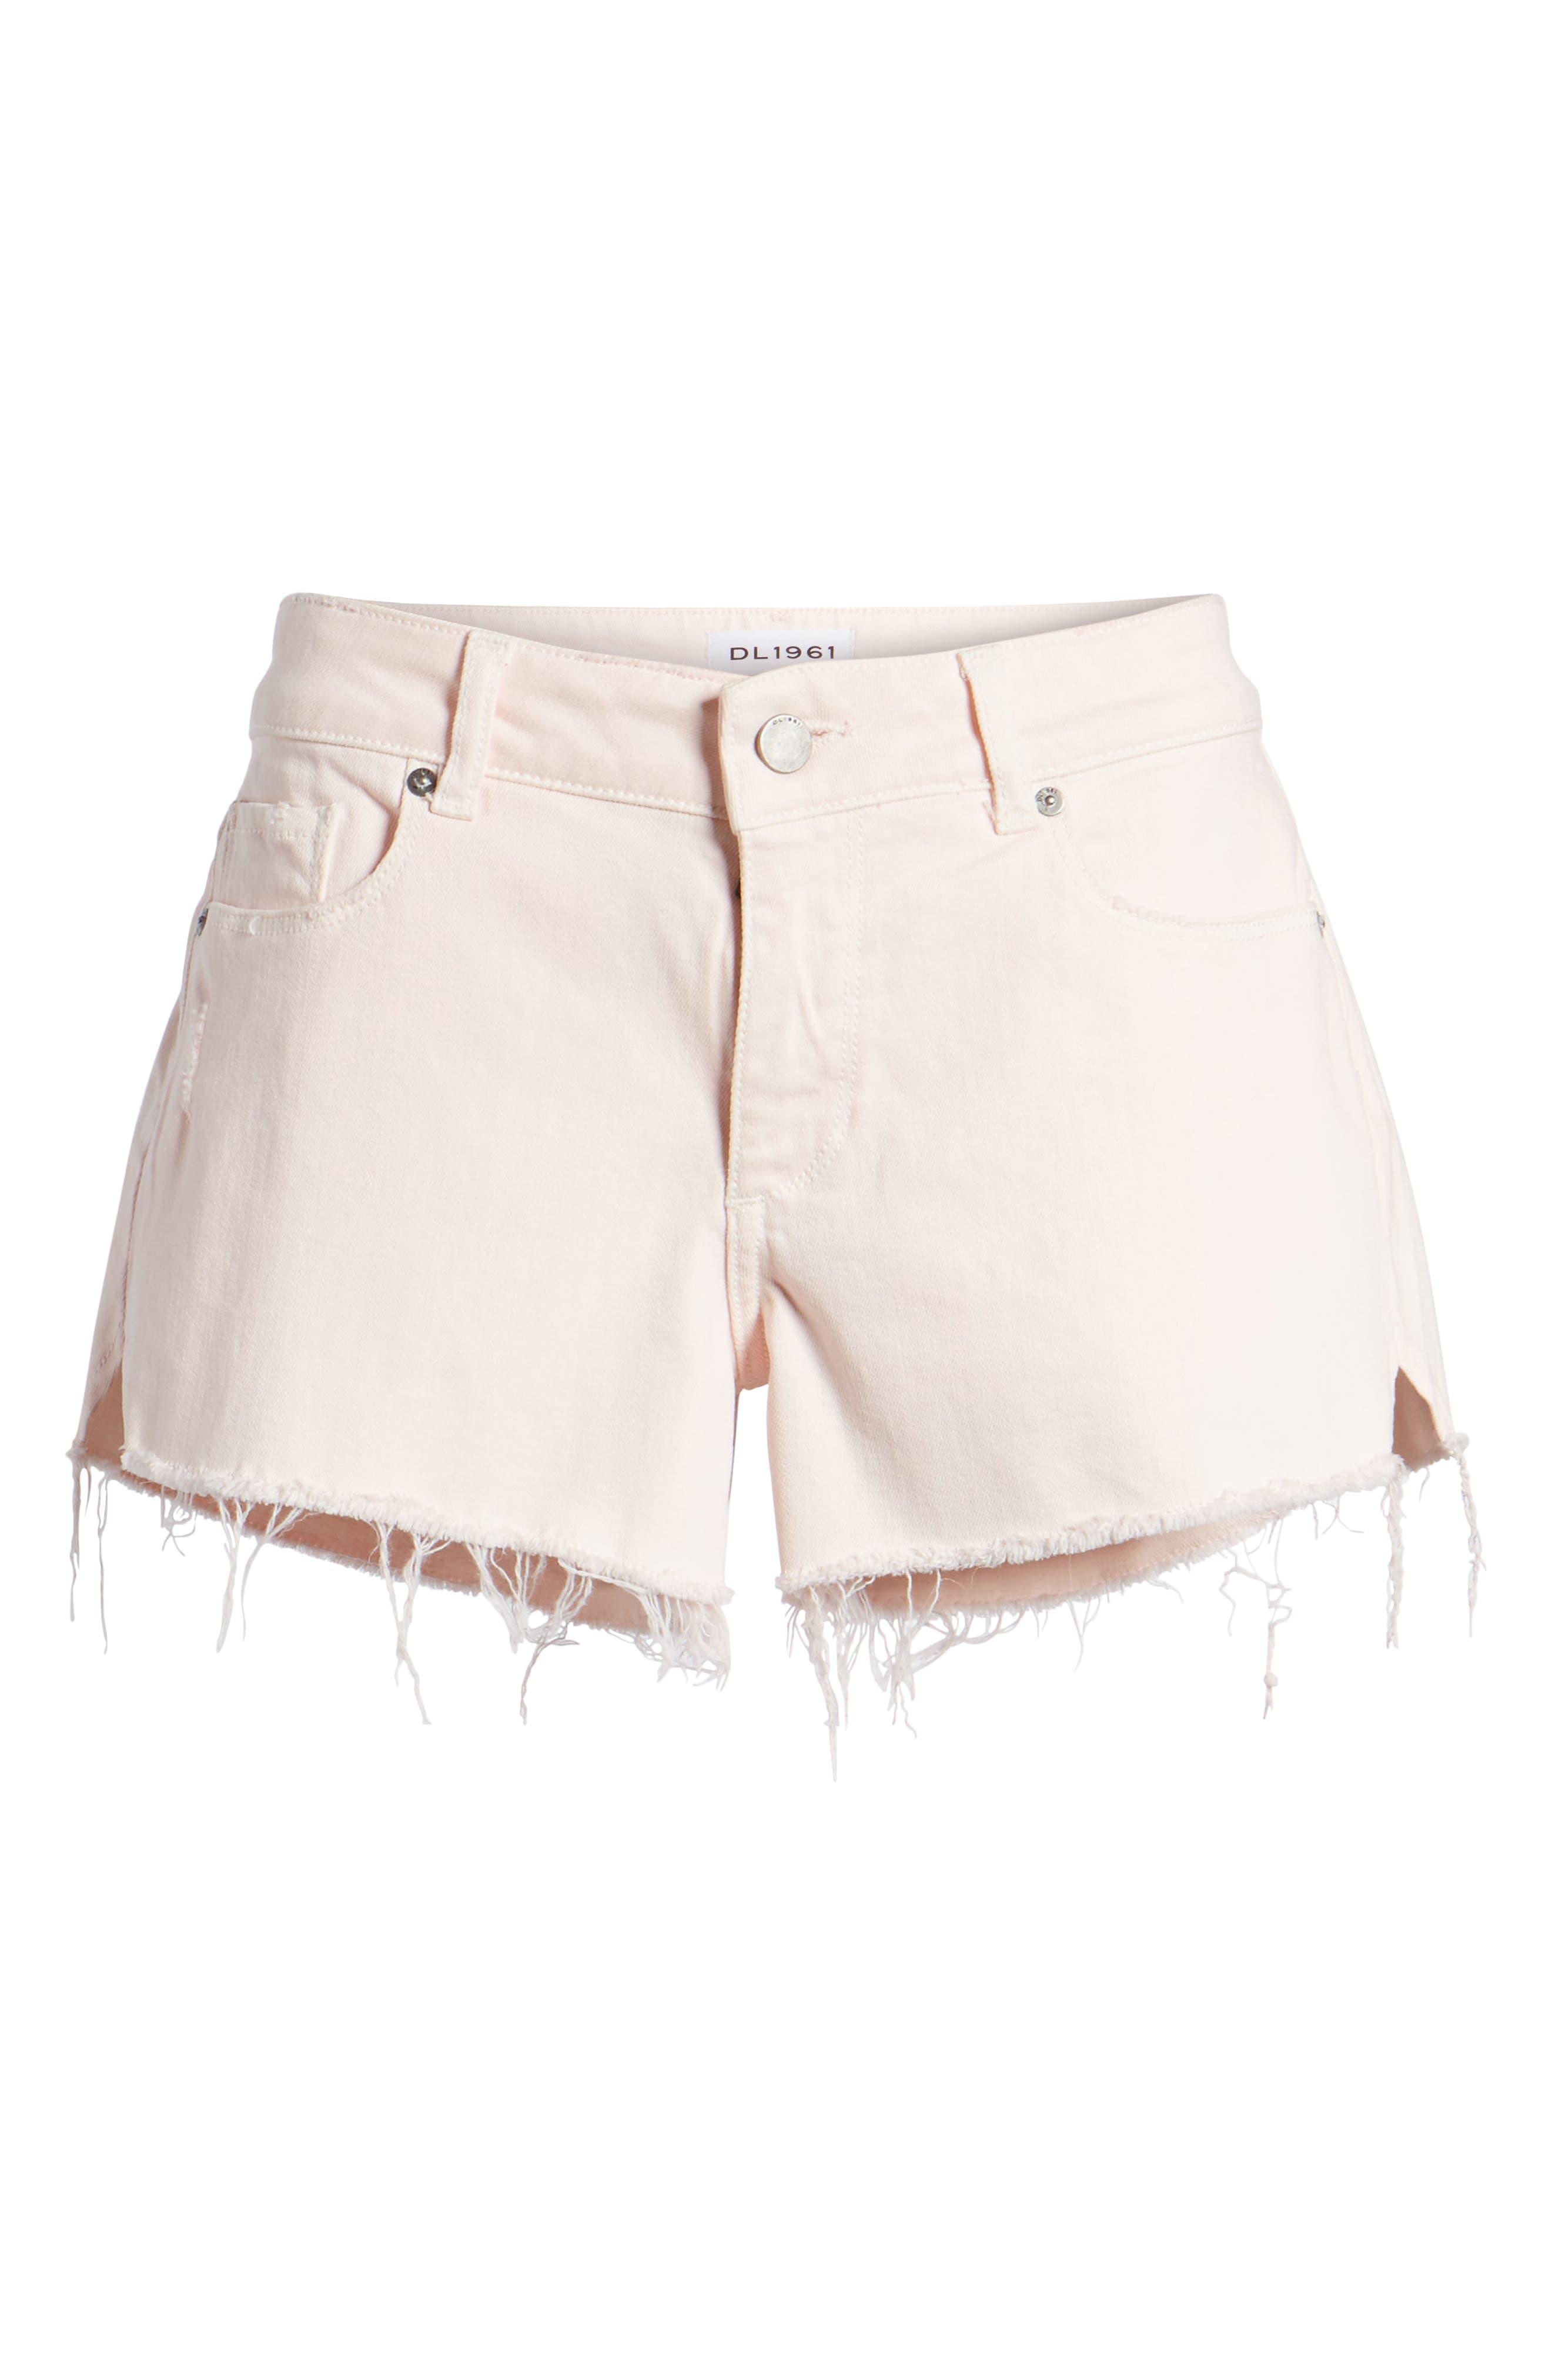 Renee Notch Raw Hem Denim Shorts,                             Alternate thumbnail 6, color,                             651